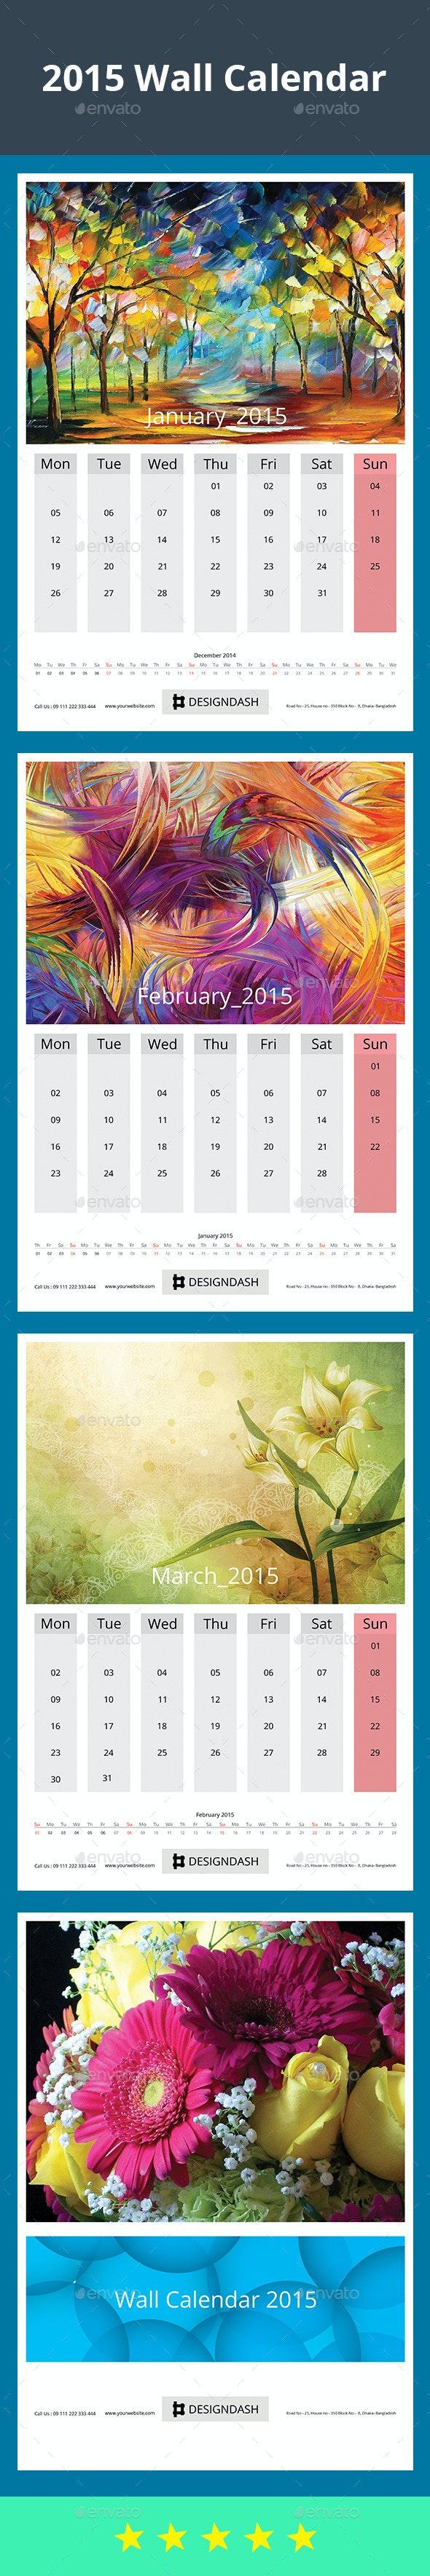 2015 Wall Calendar Design - Stationery Print Templates